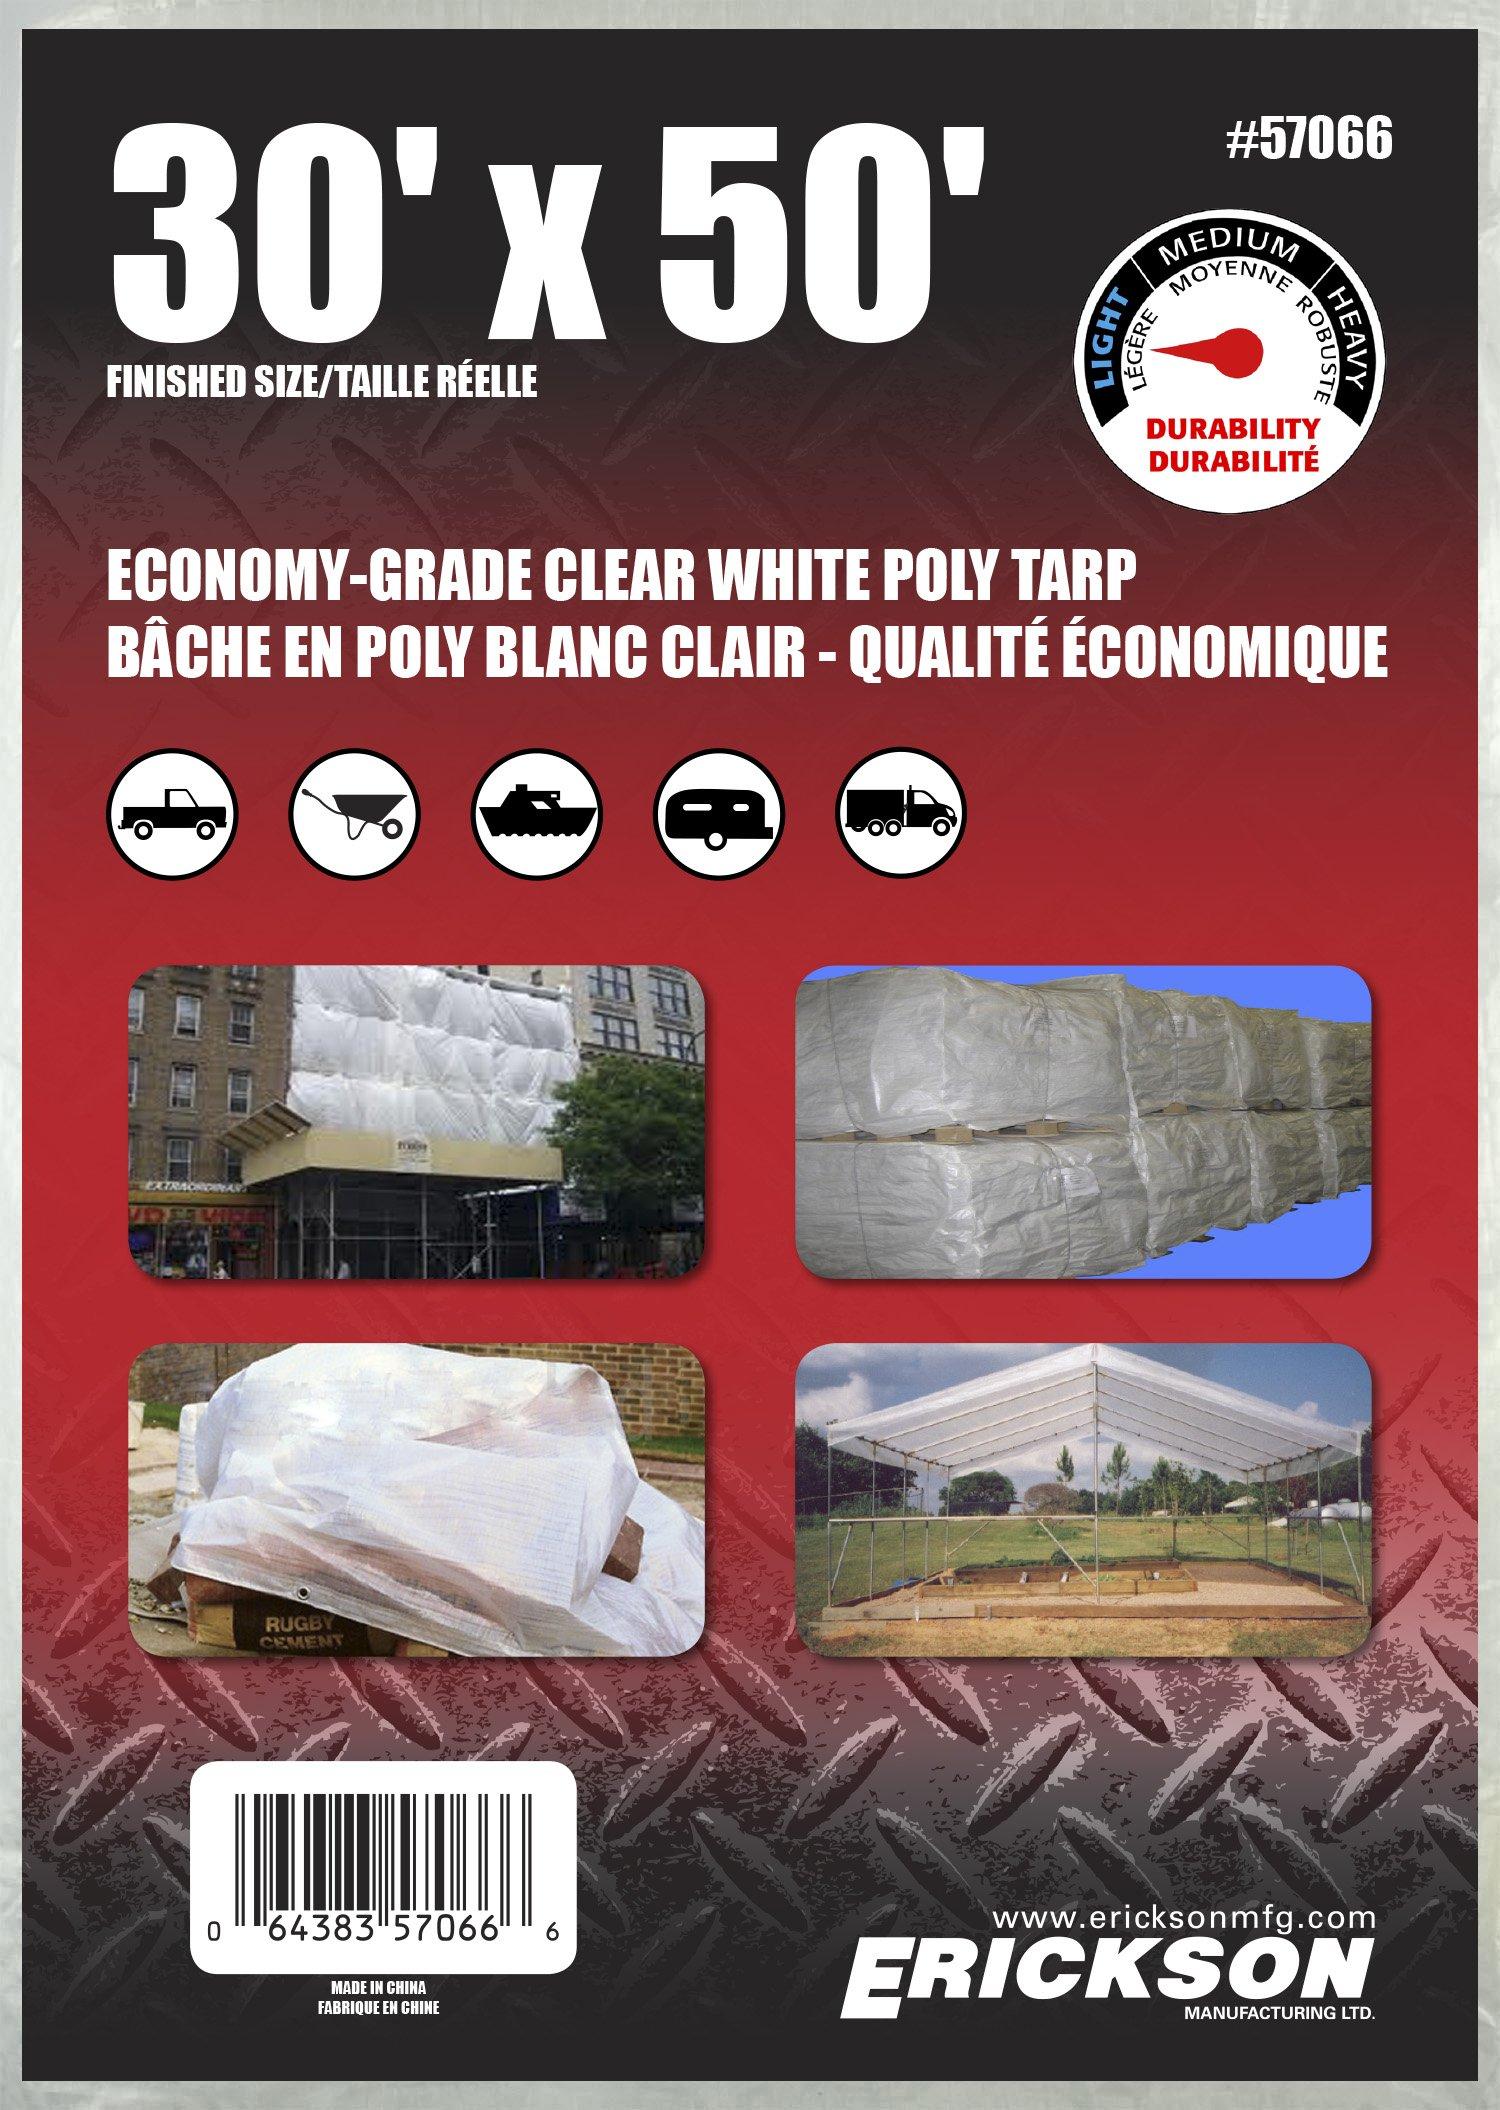 Erickson 57066 Clear White Economy Grade Poly Tarp, 30' x 50', 1 Pack